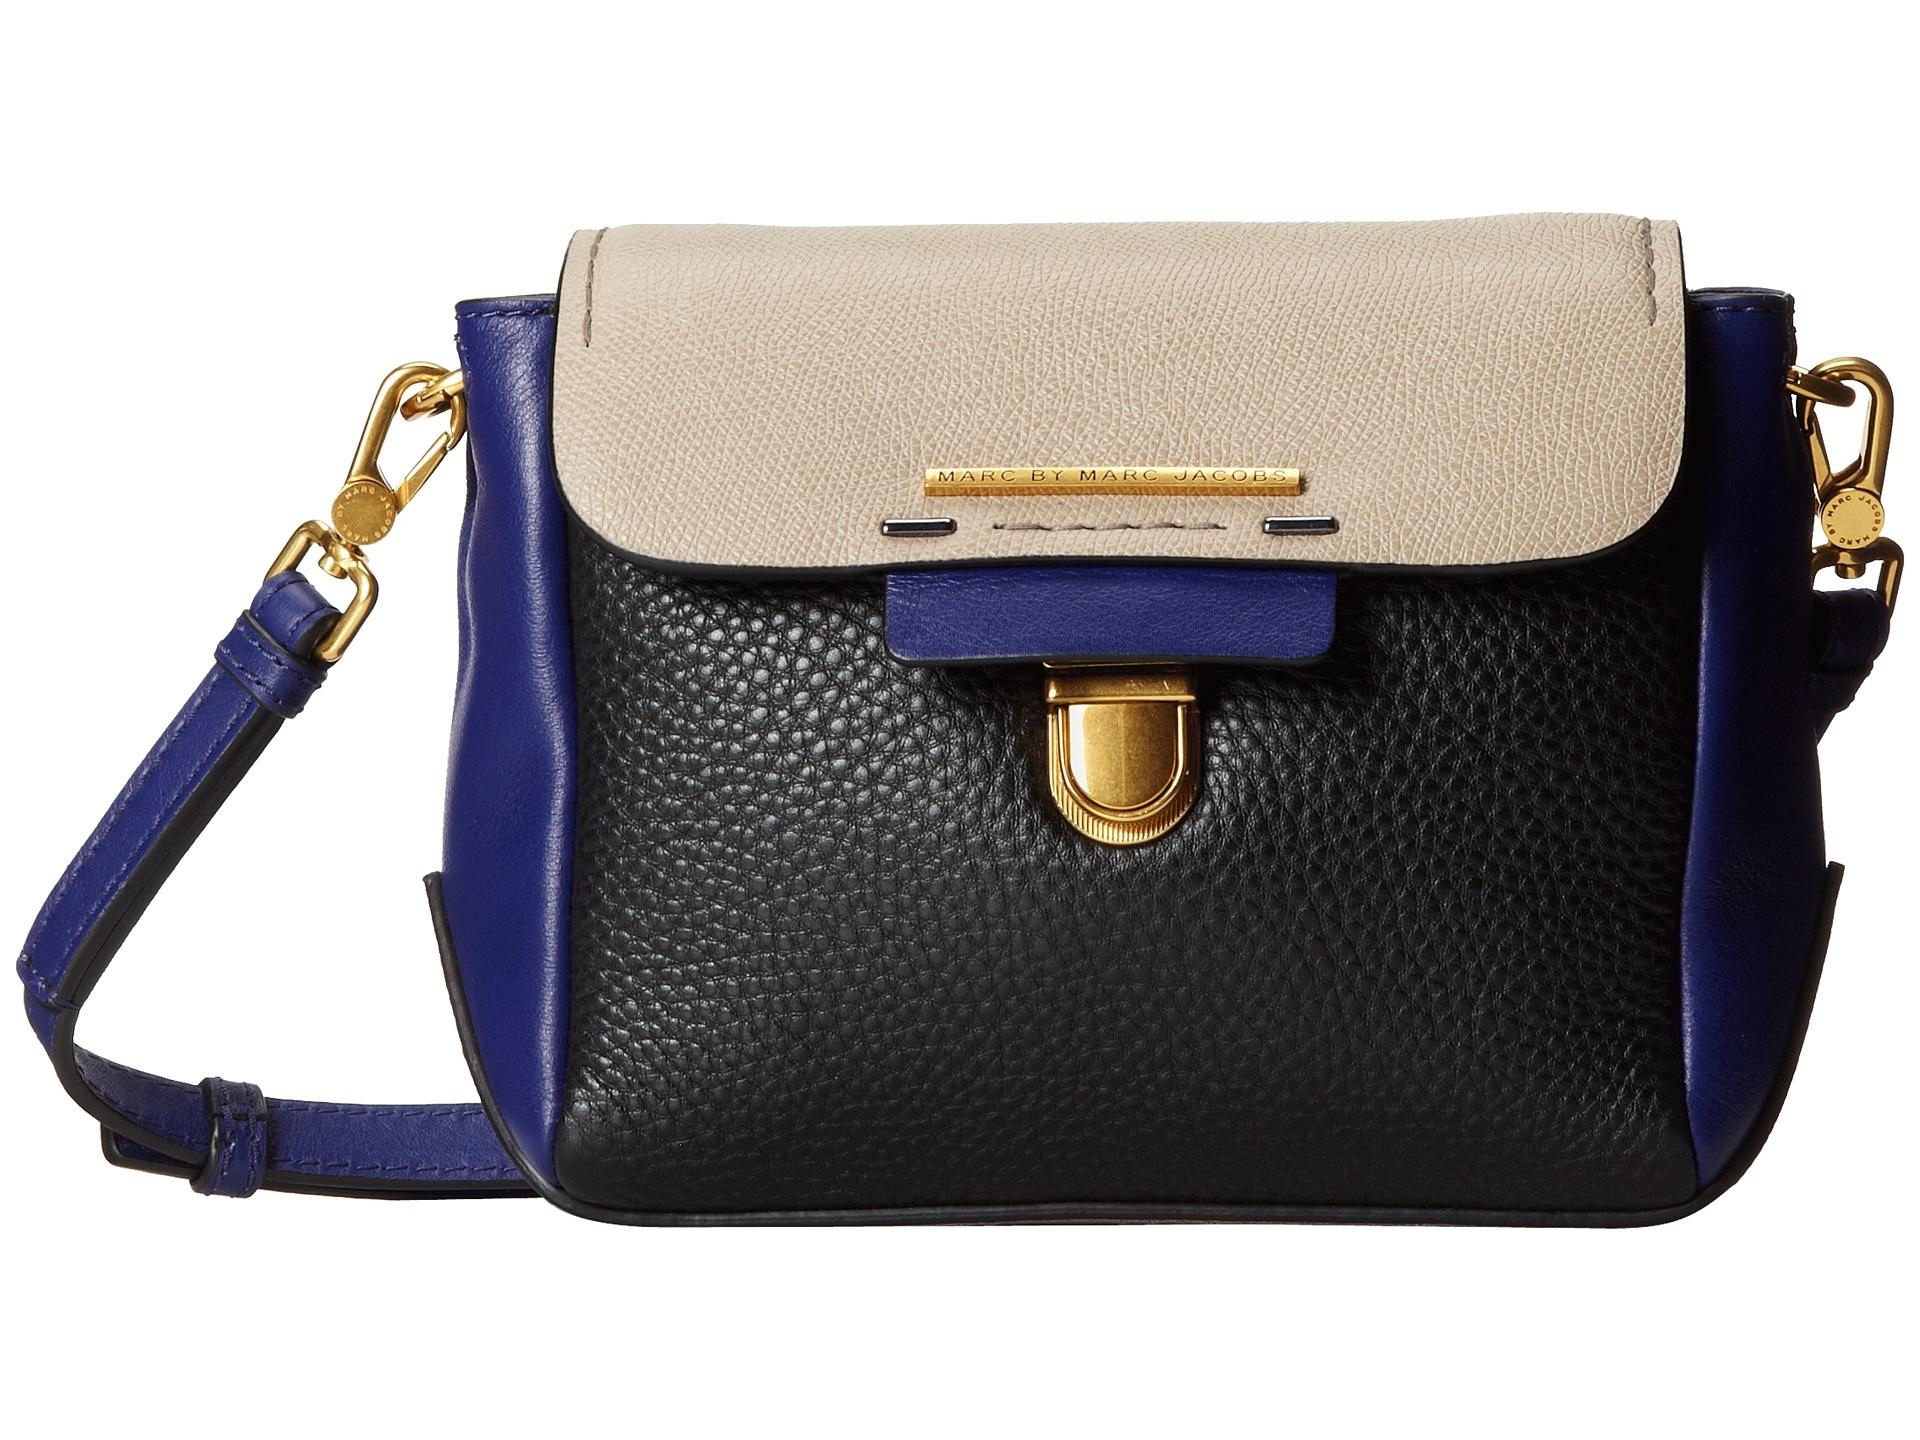 Сумки Marc Jacobs - сумка Marc Jacobs MMJ-B4793 a71a0dc3a52